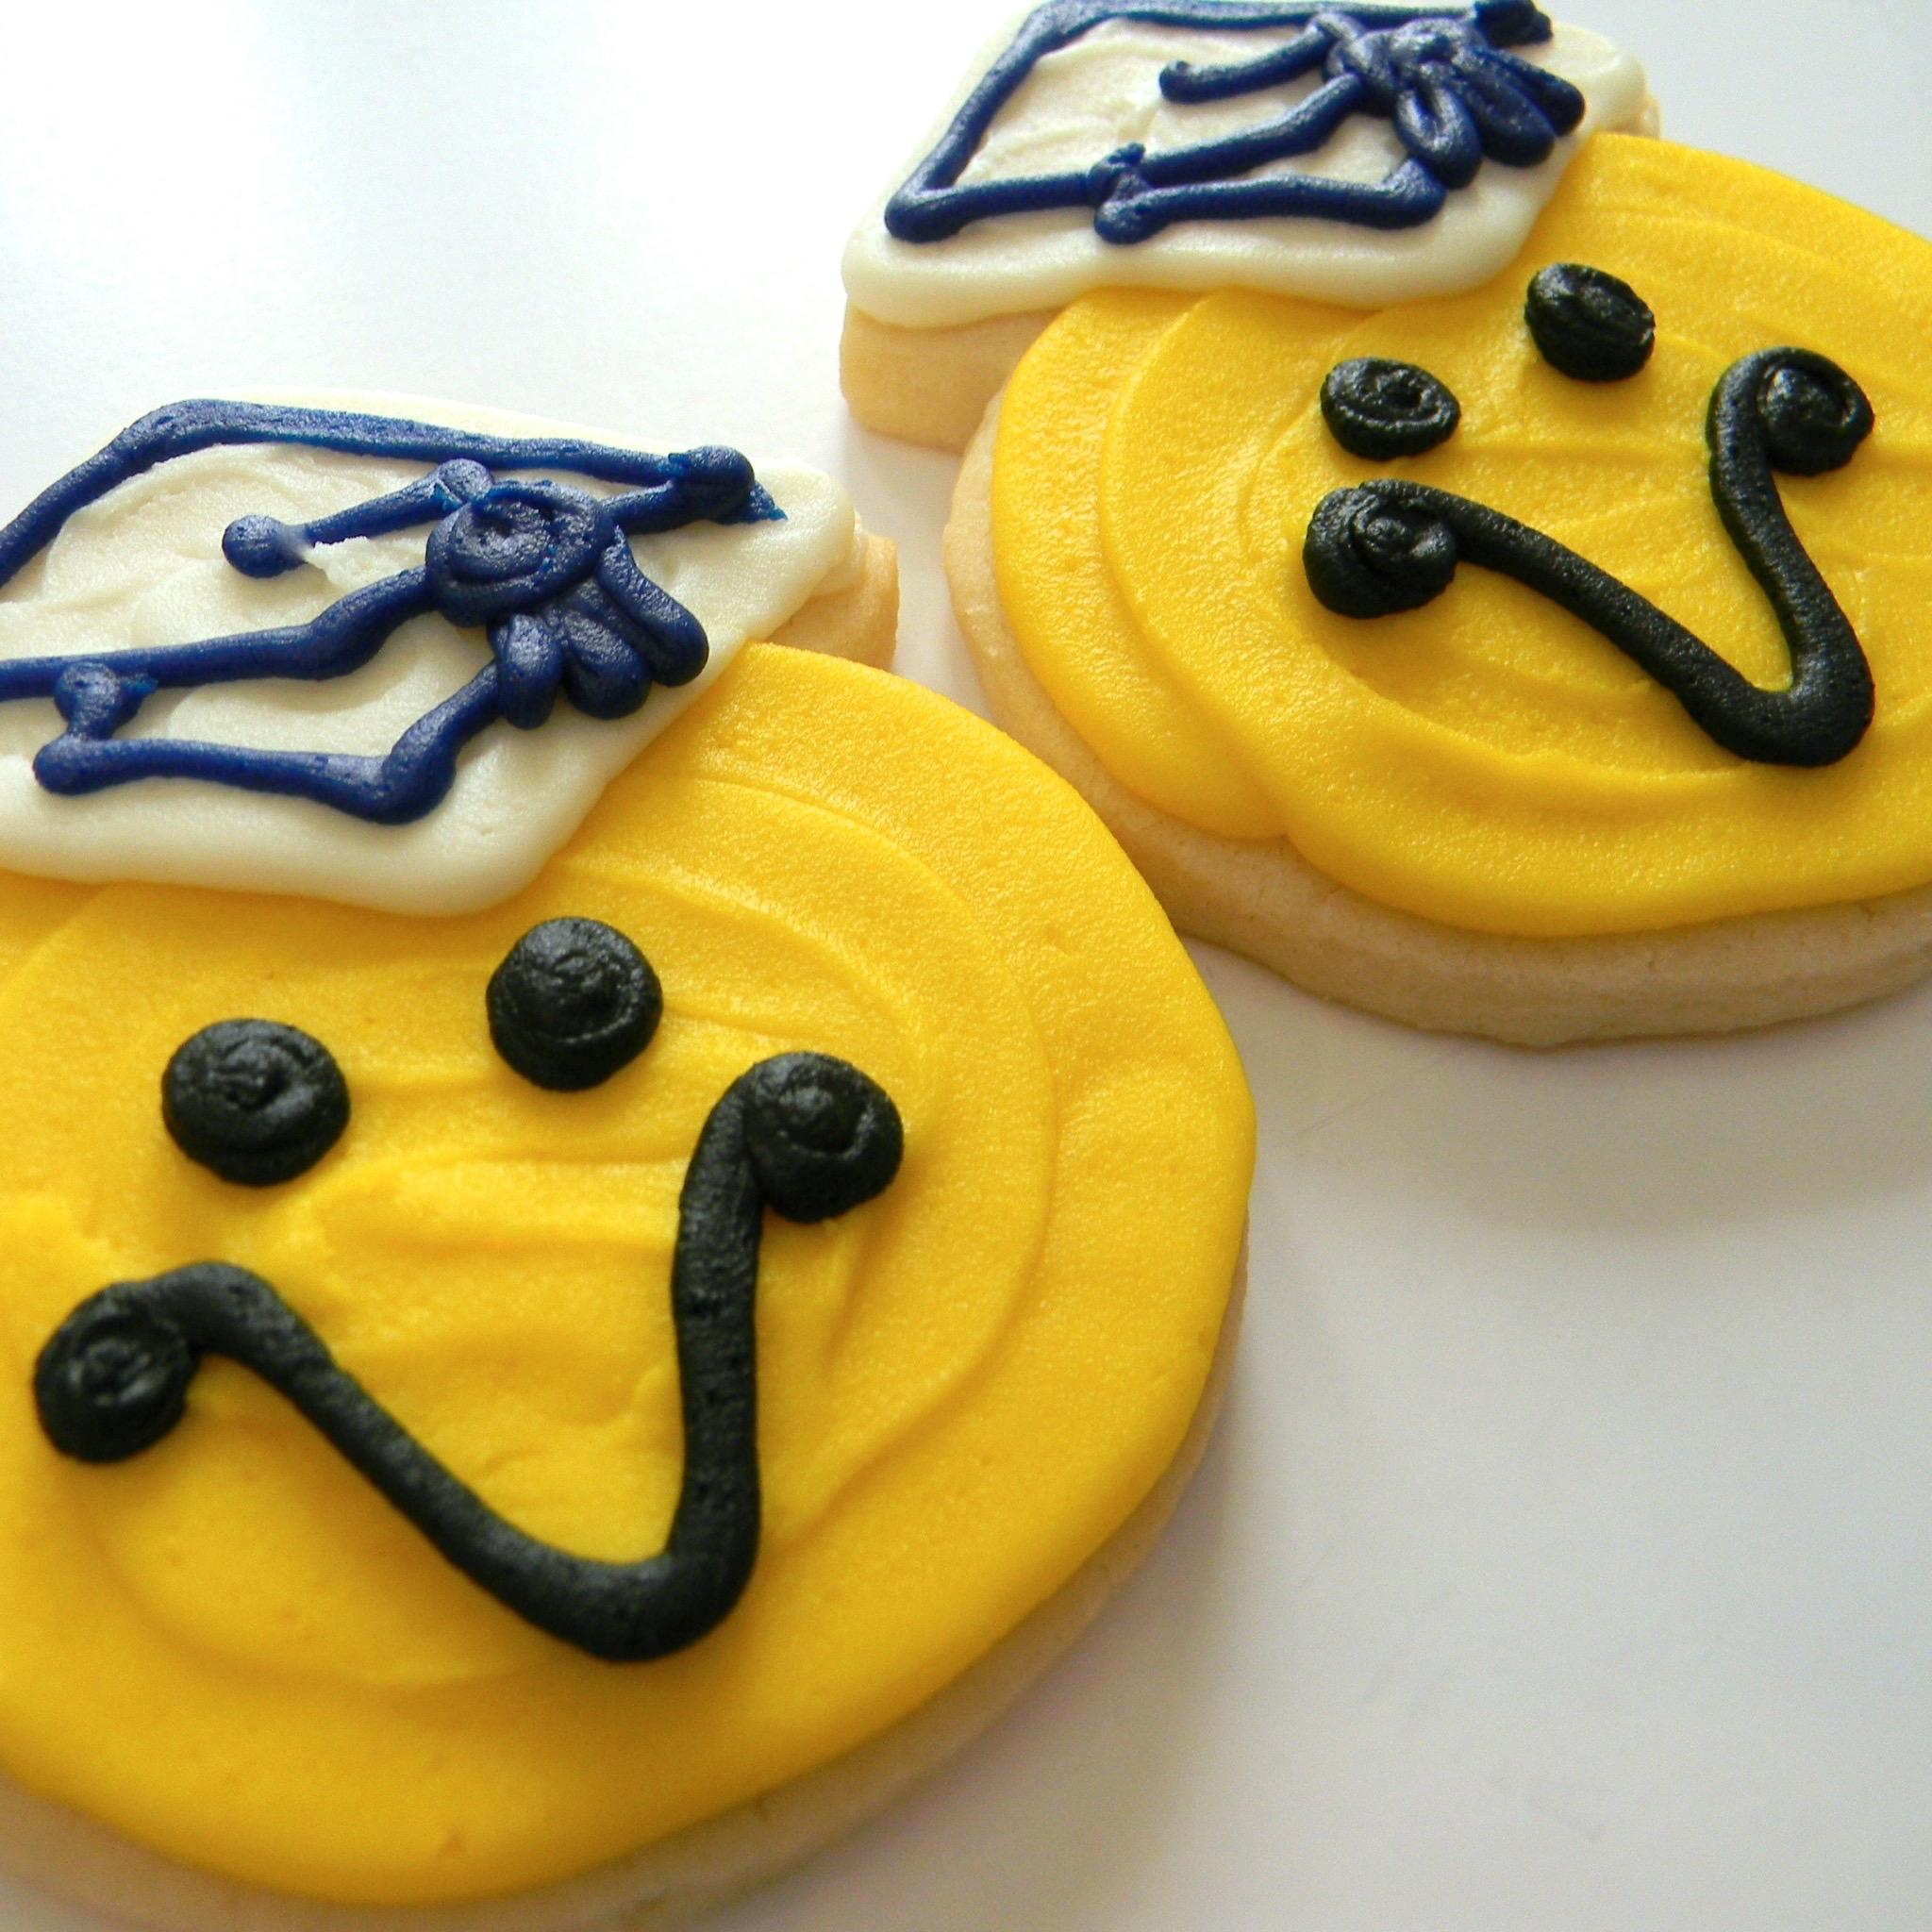 cookie.smiley.face.graduation.cap.jpg